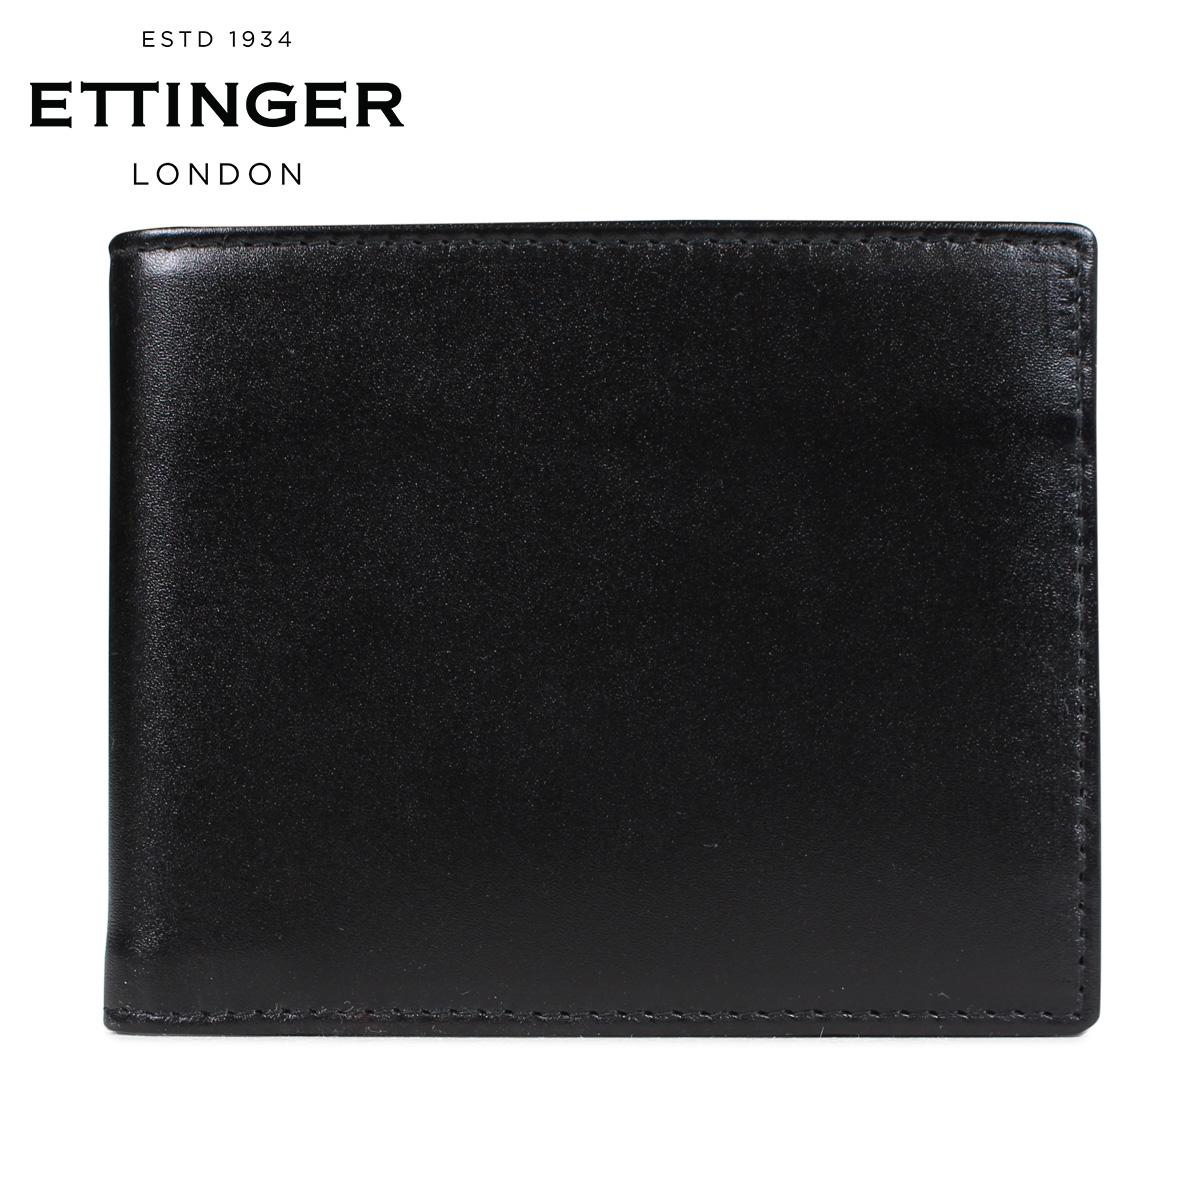 ETTINGER BILLFOLD WALLET WITH CARD CASE エッティンガー 財布 二つ折り メンズ レザー ブラック 黒 ST030CJR [3/18 新入荷]